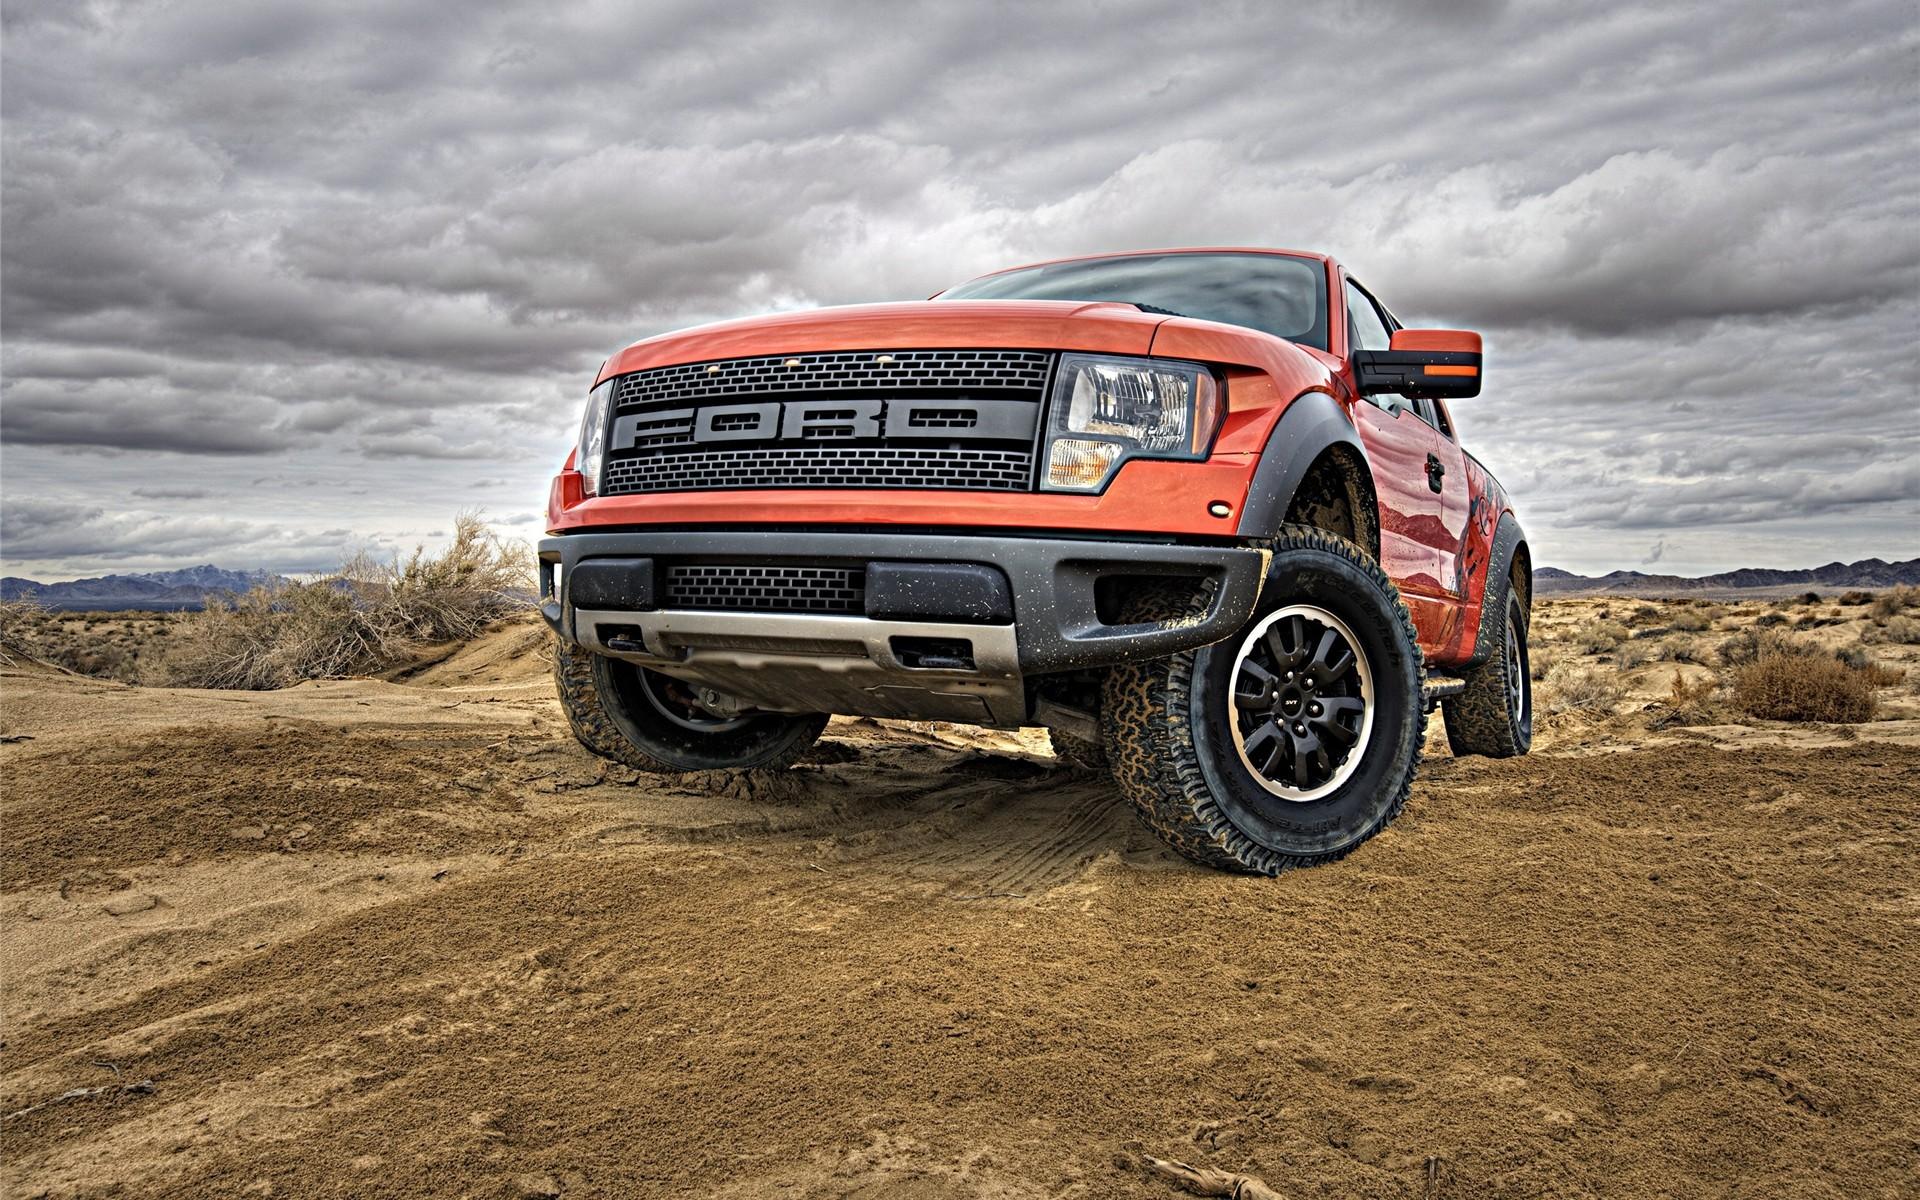 US Auto Sales Numbers:Ford, G M, Chrysler, Toyota, Honda, Nissan, Kia/Hyundai, Volkswagen